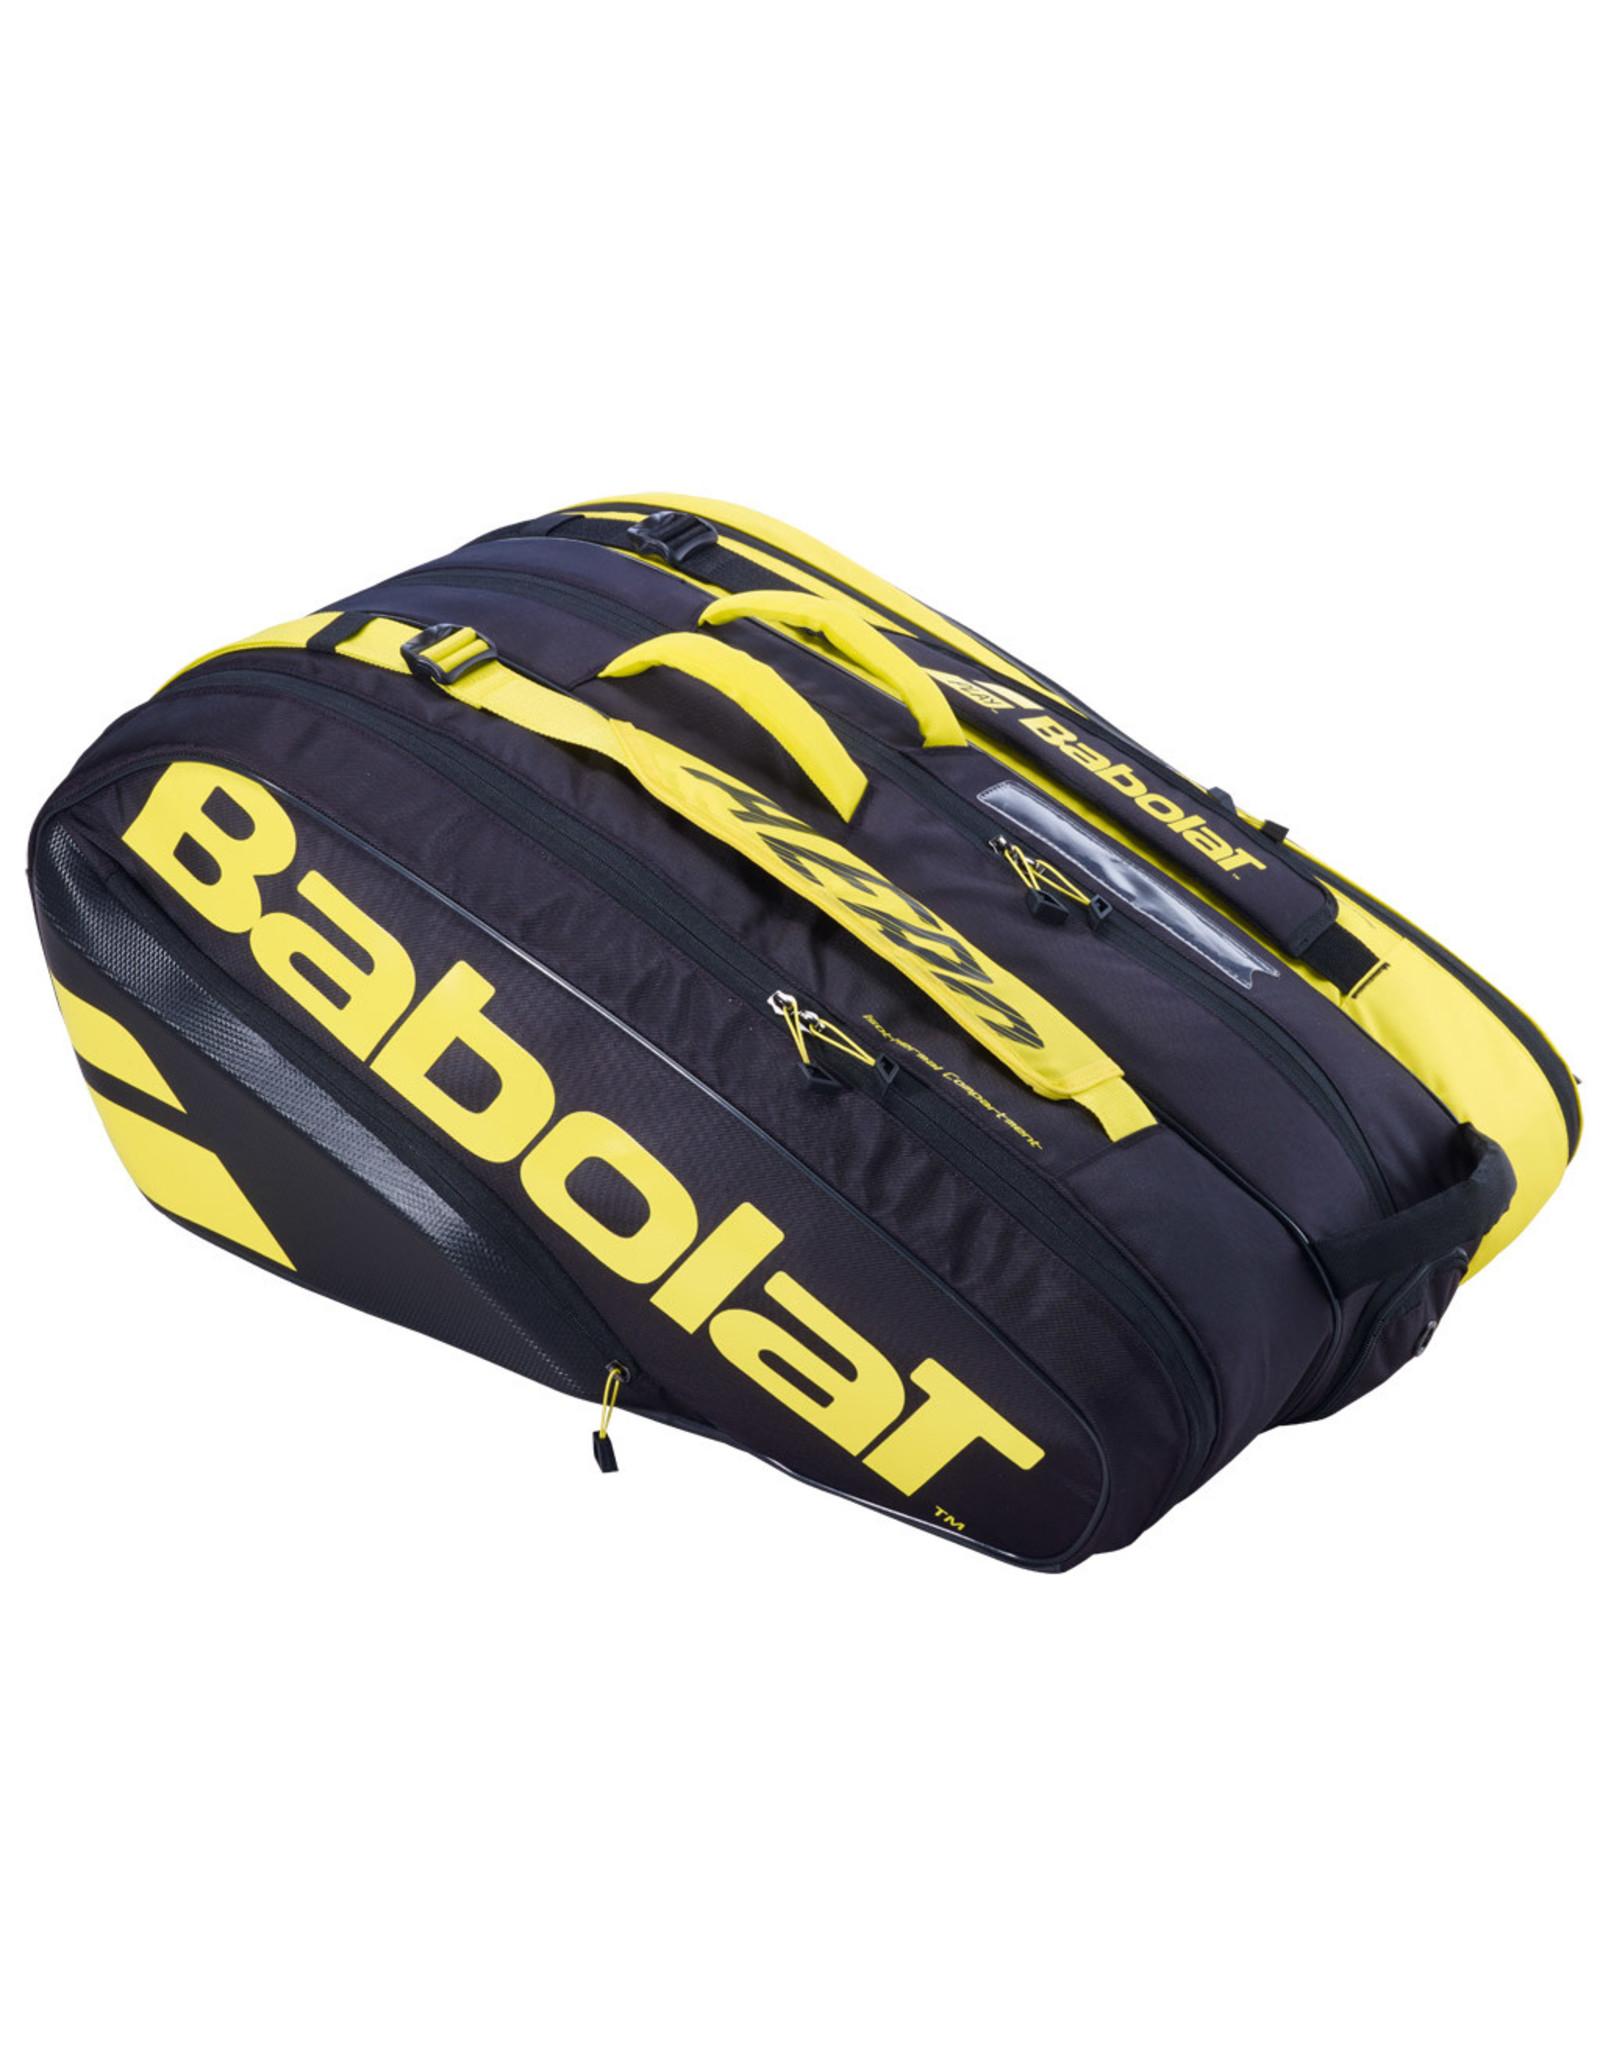 Babolat Babolat Pure Aero RHx12 Tennis Bag Black and Yellow